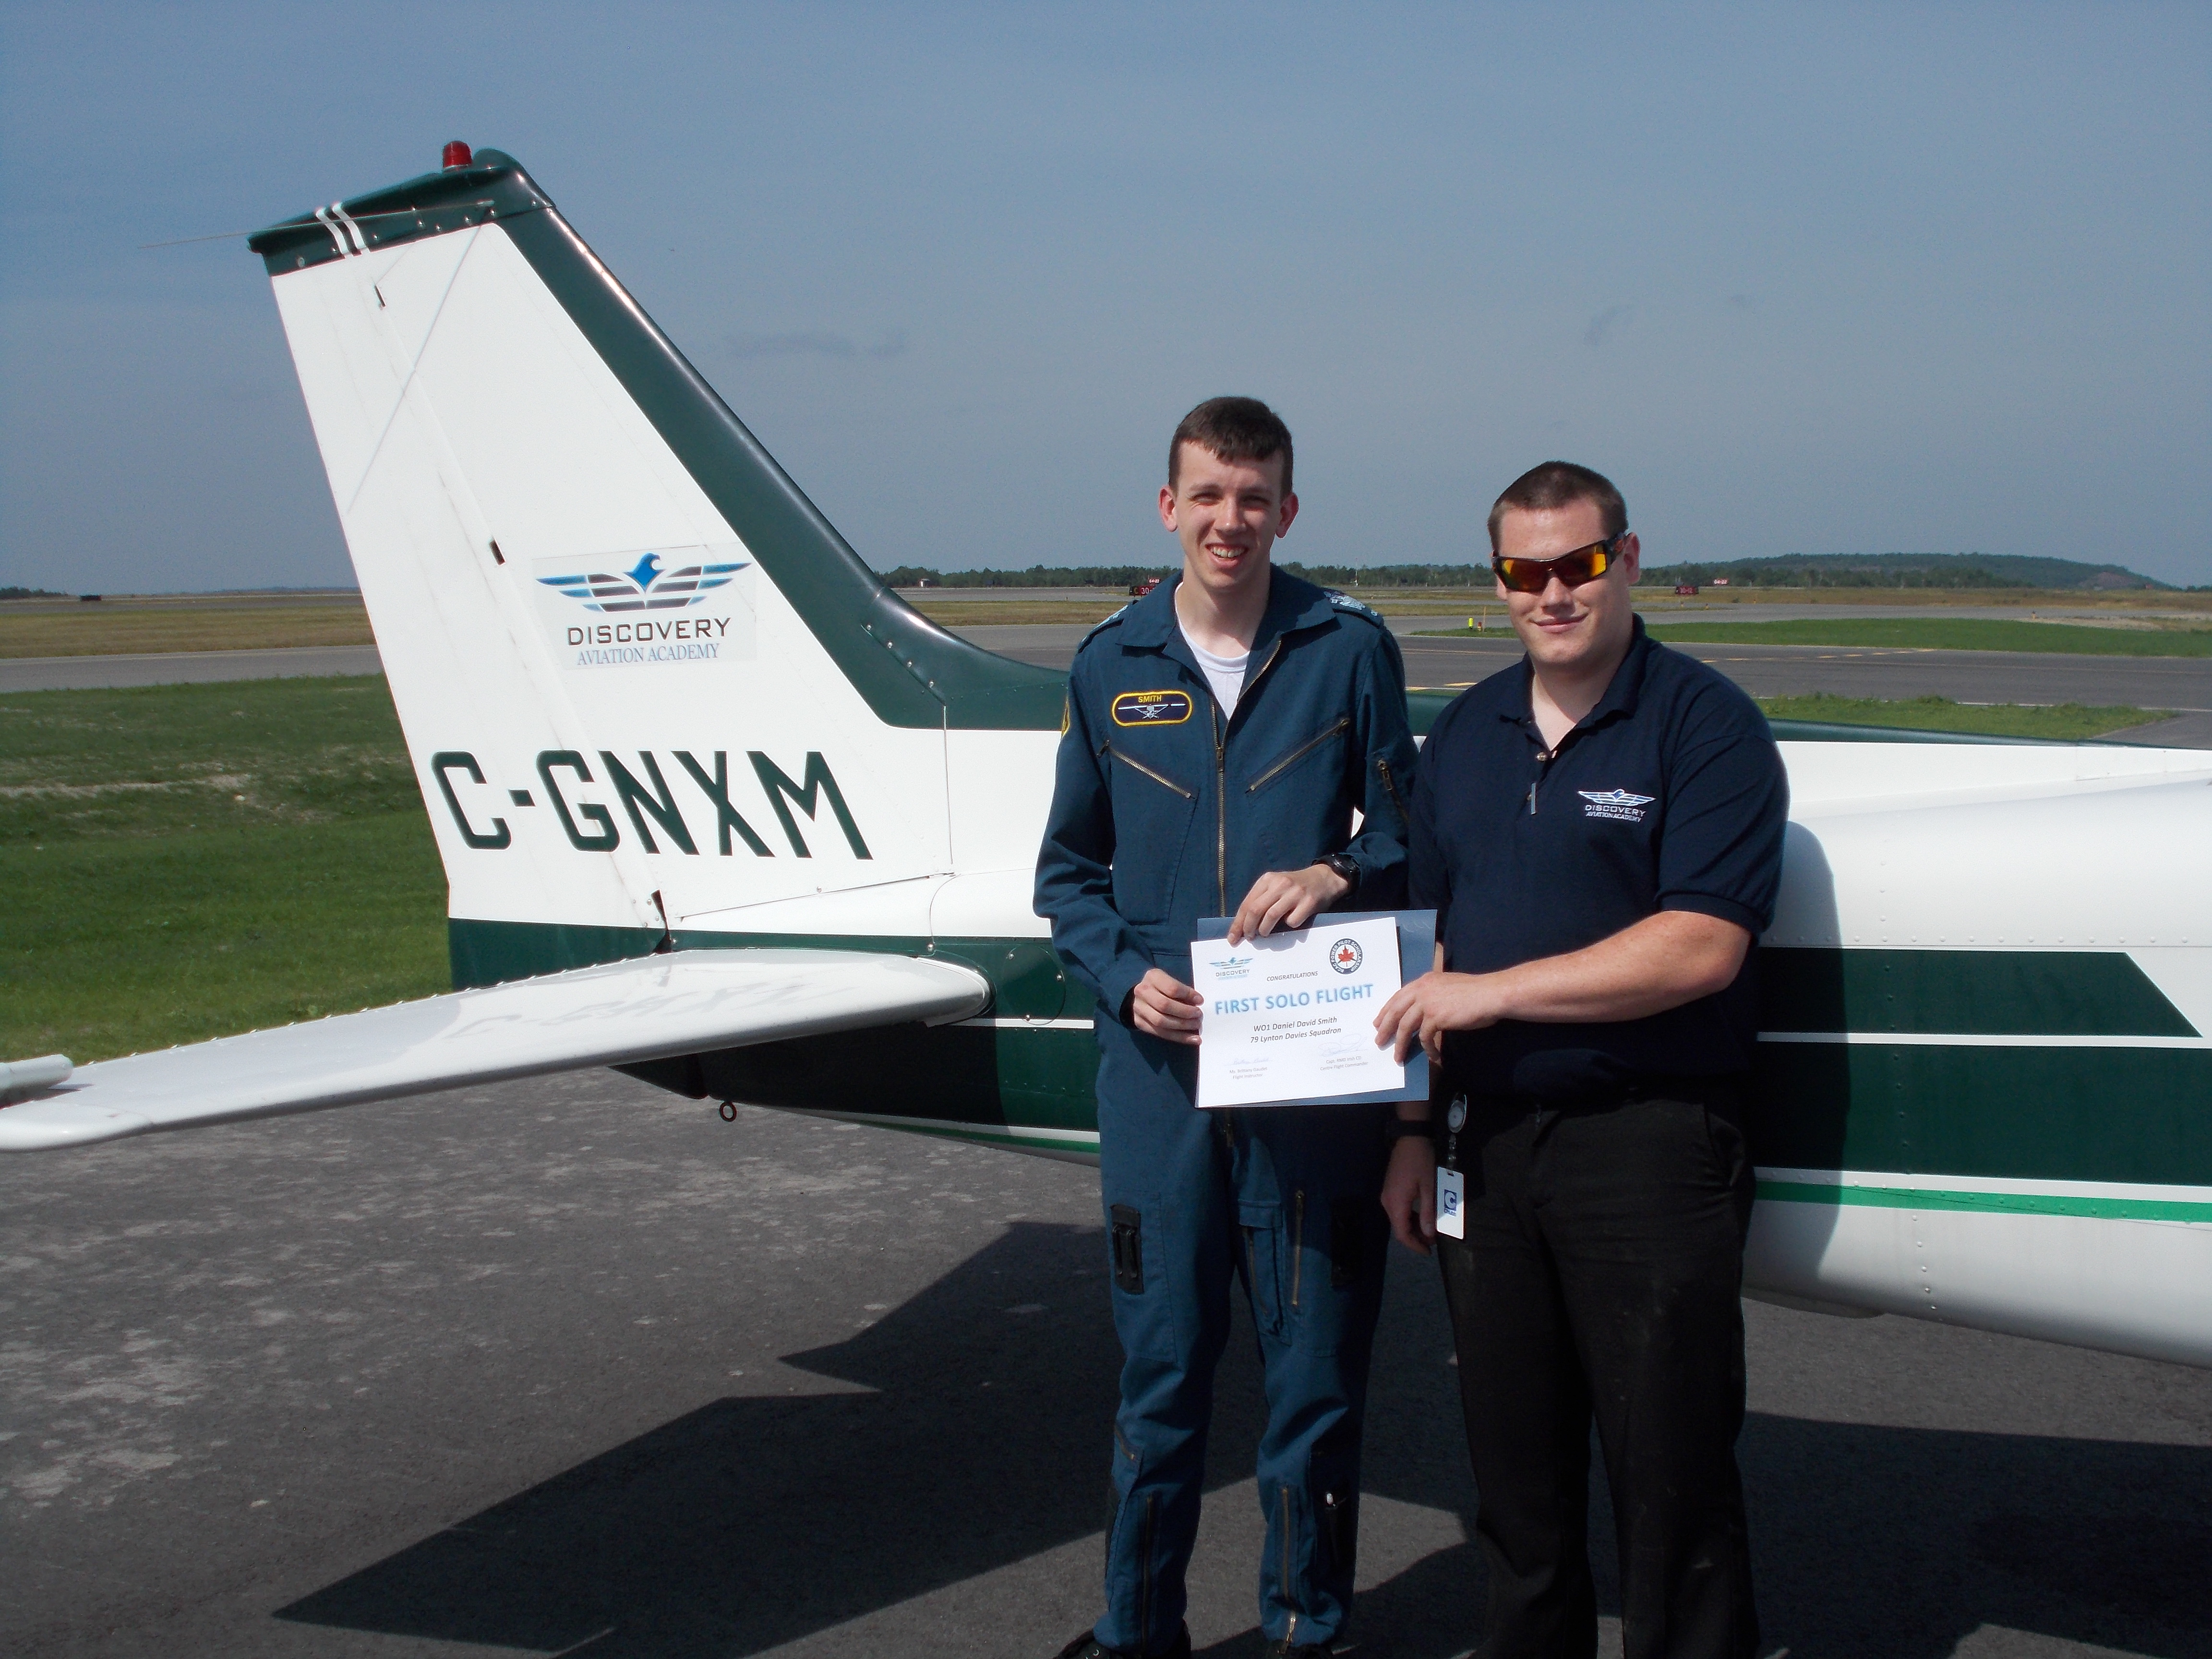 WO1-Smith-solo-flight-21-Jul-16-Discovery-Aviation-Academy-Sudbury